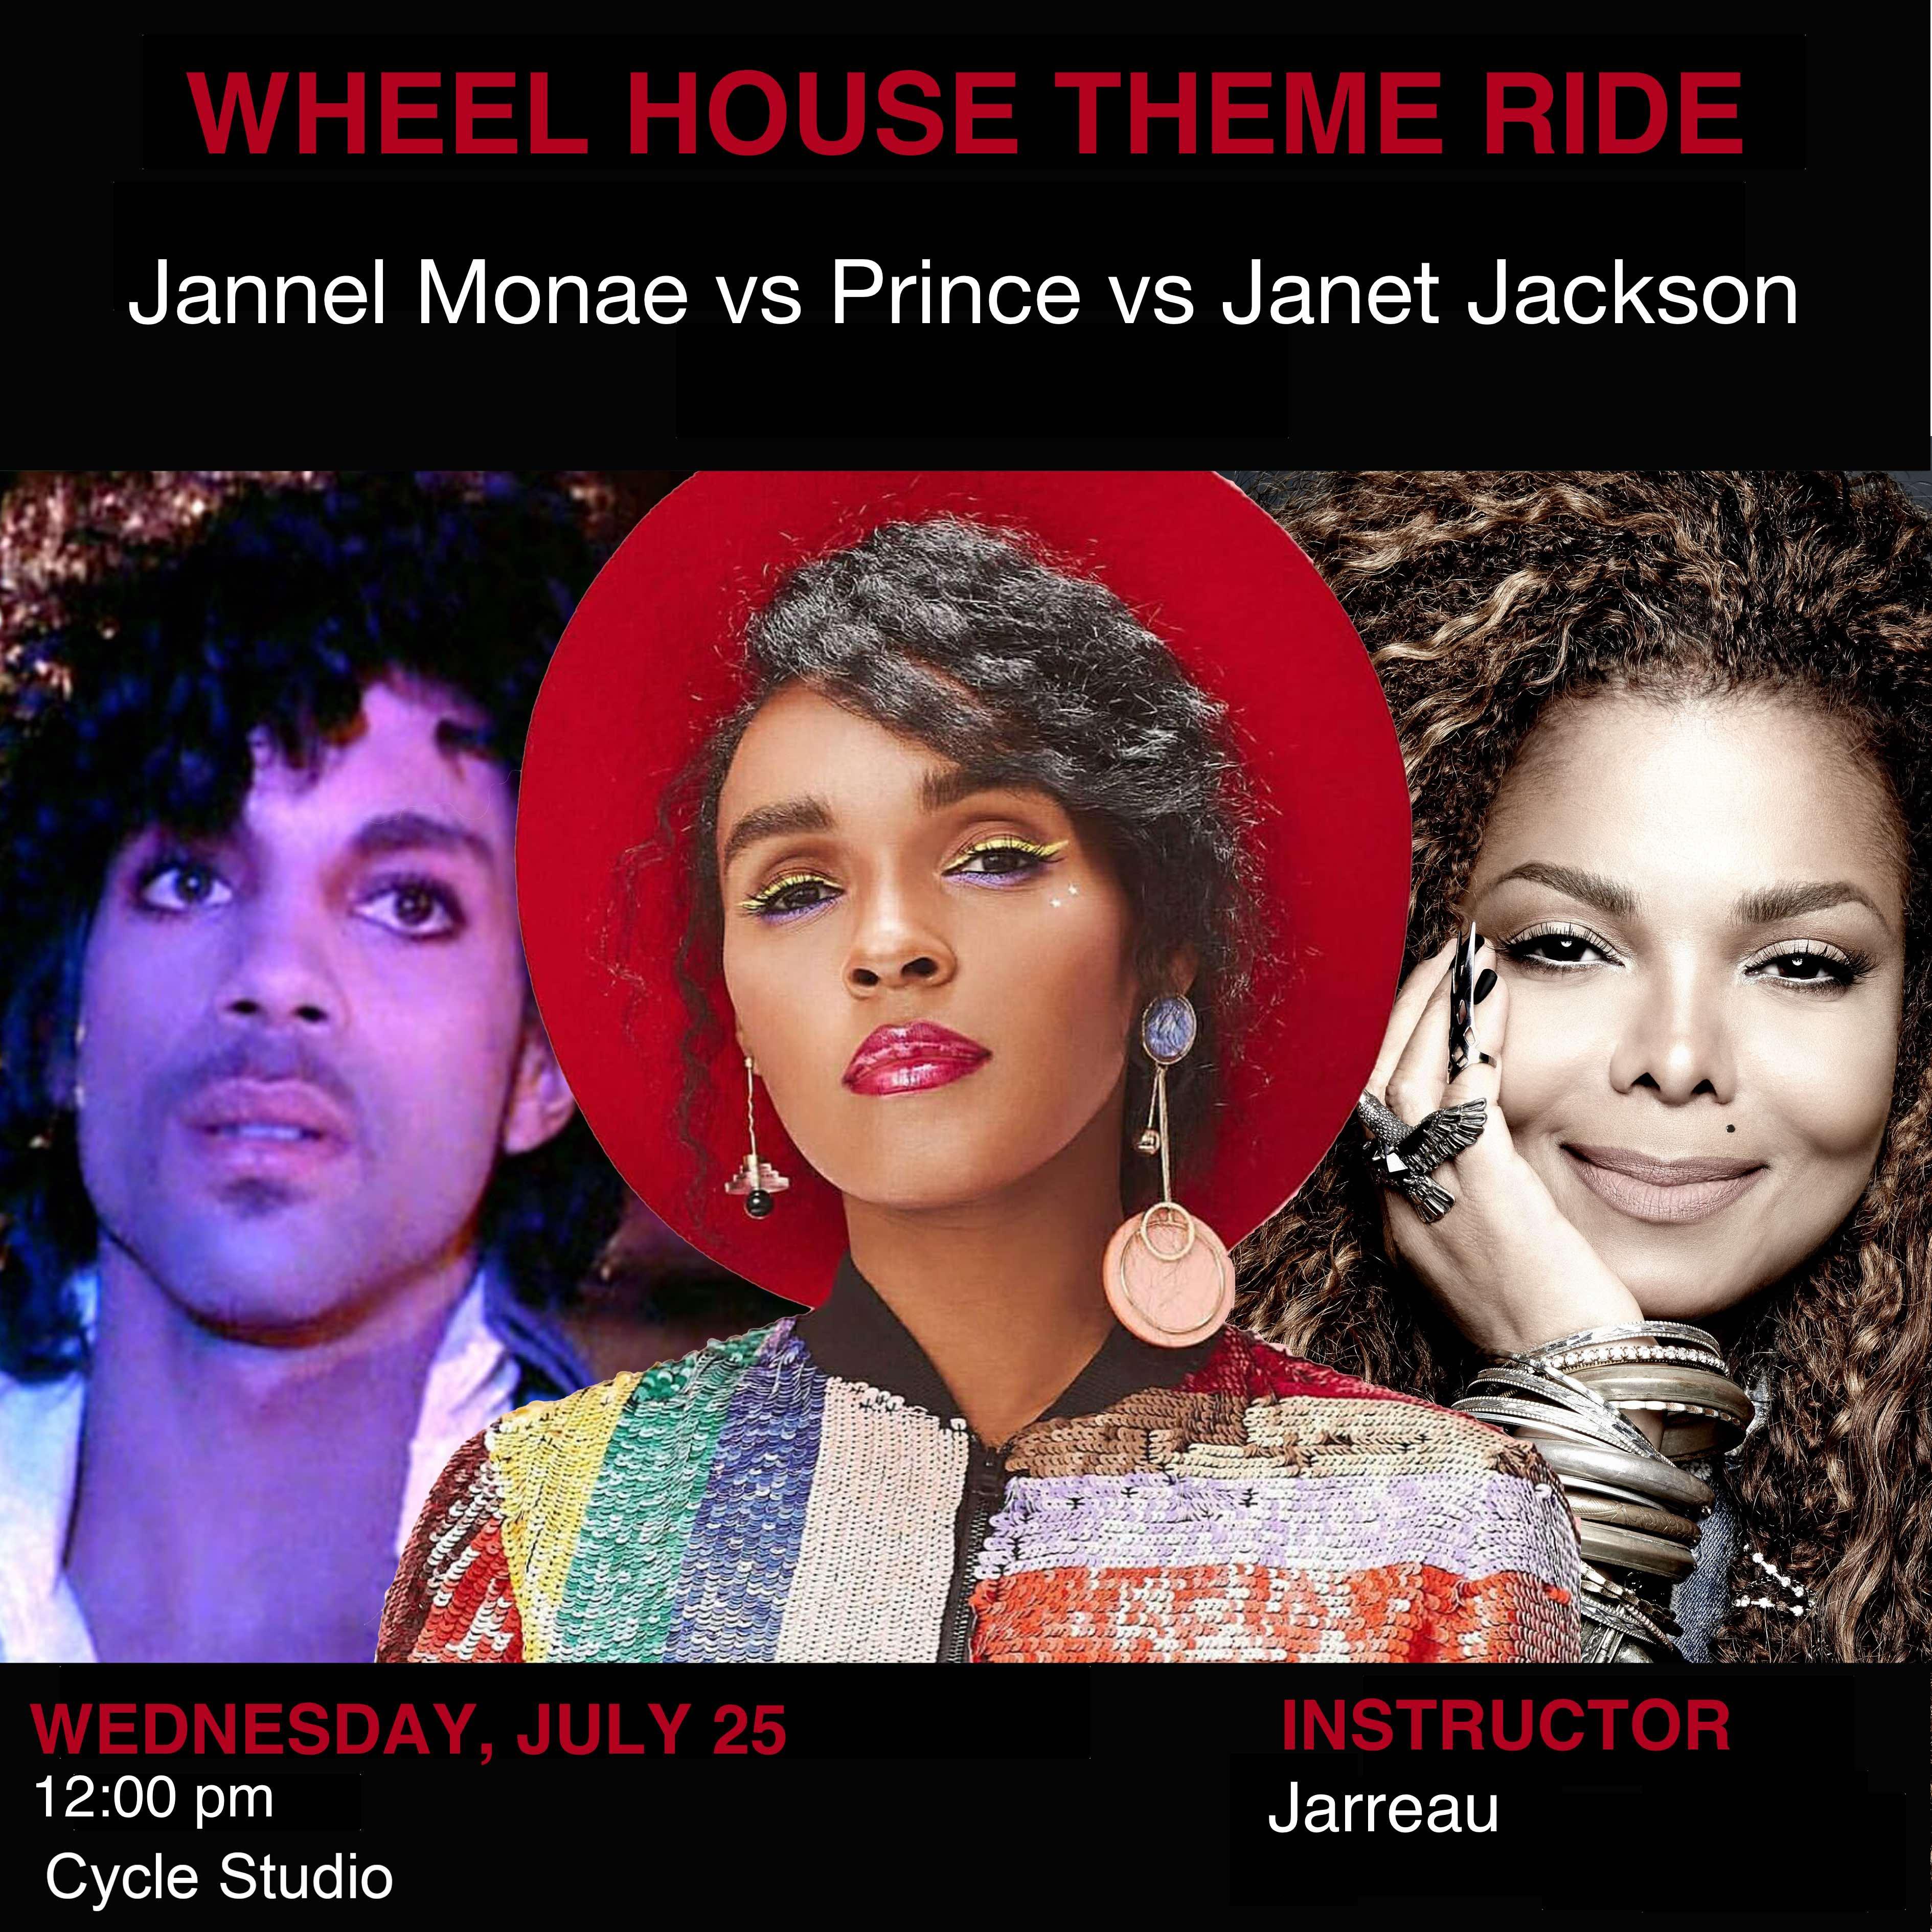 Jannel Monae vs Prince vs Janet Jackson